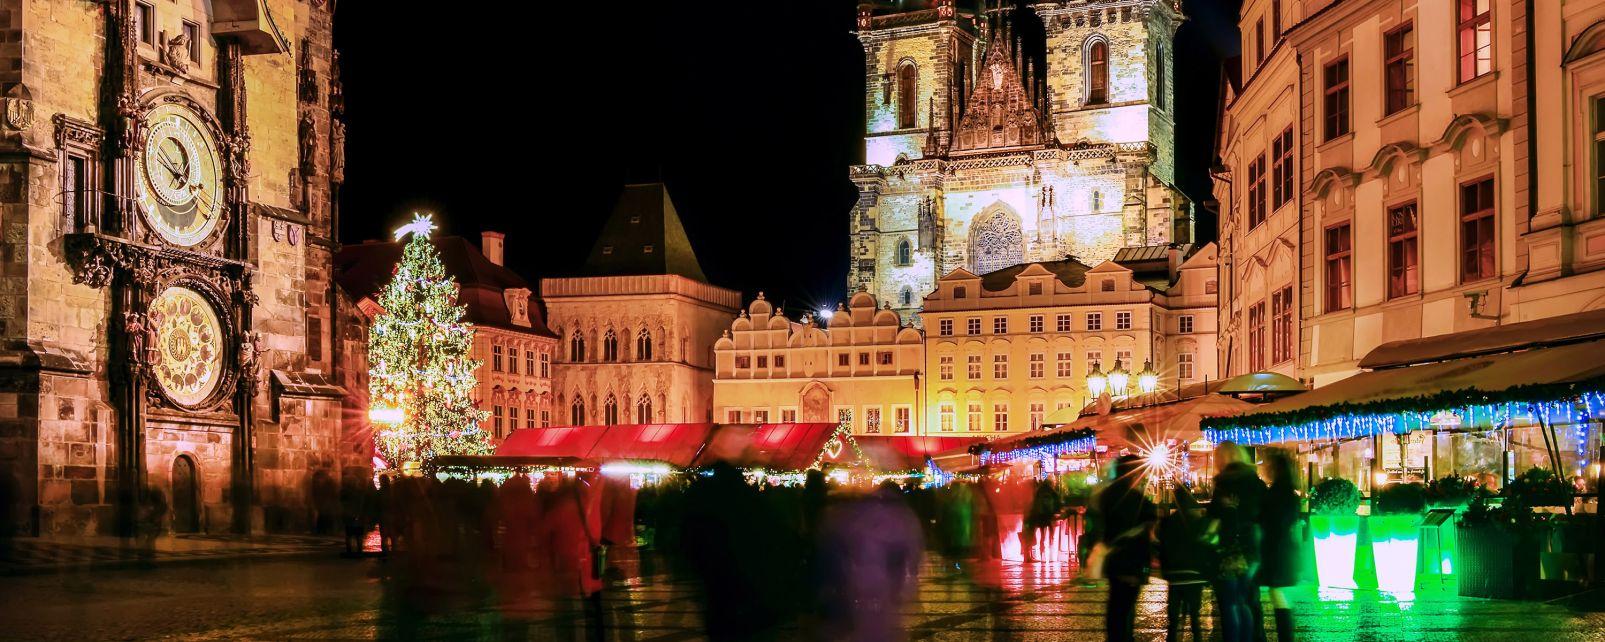 dating customs in czech republic